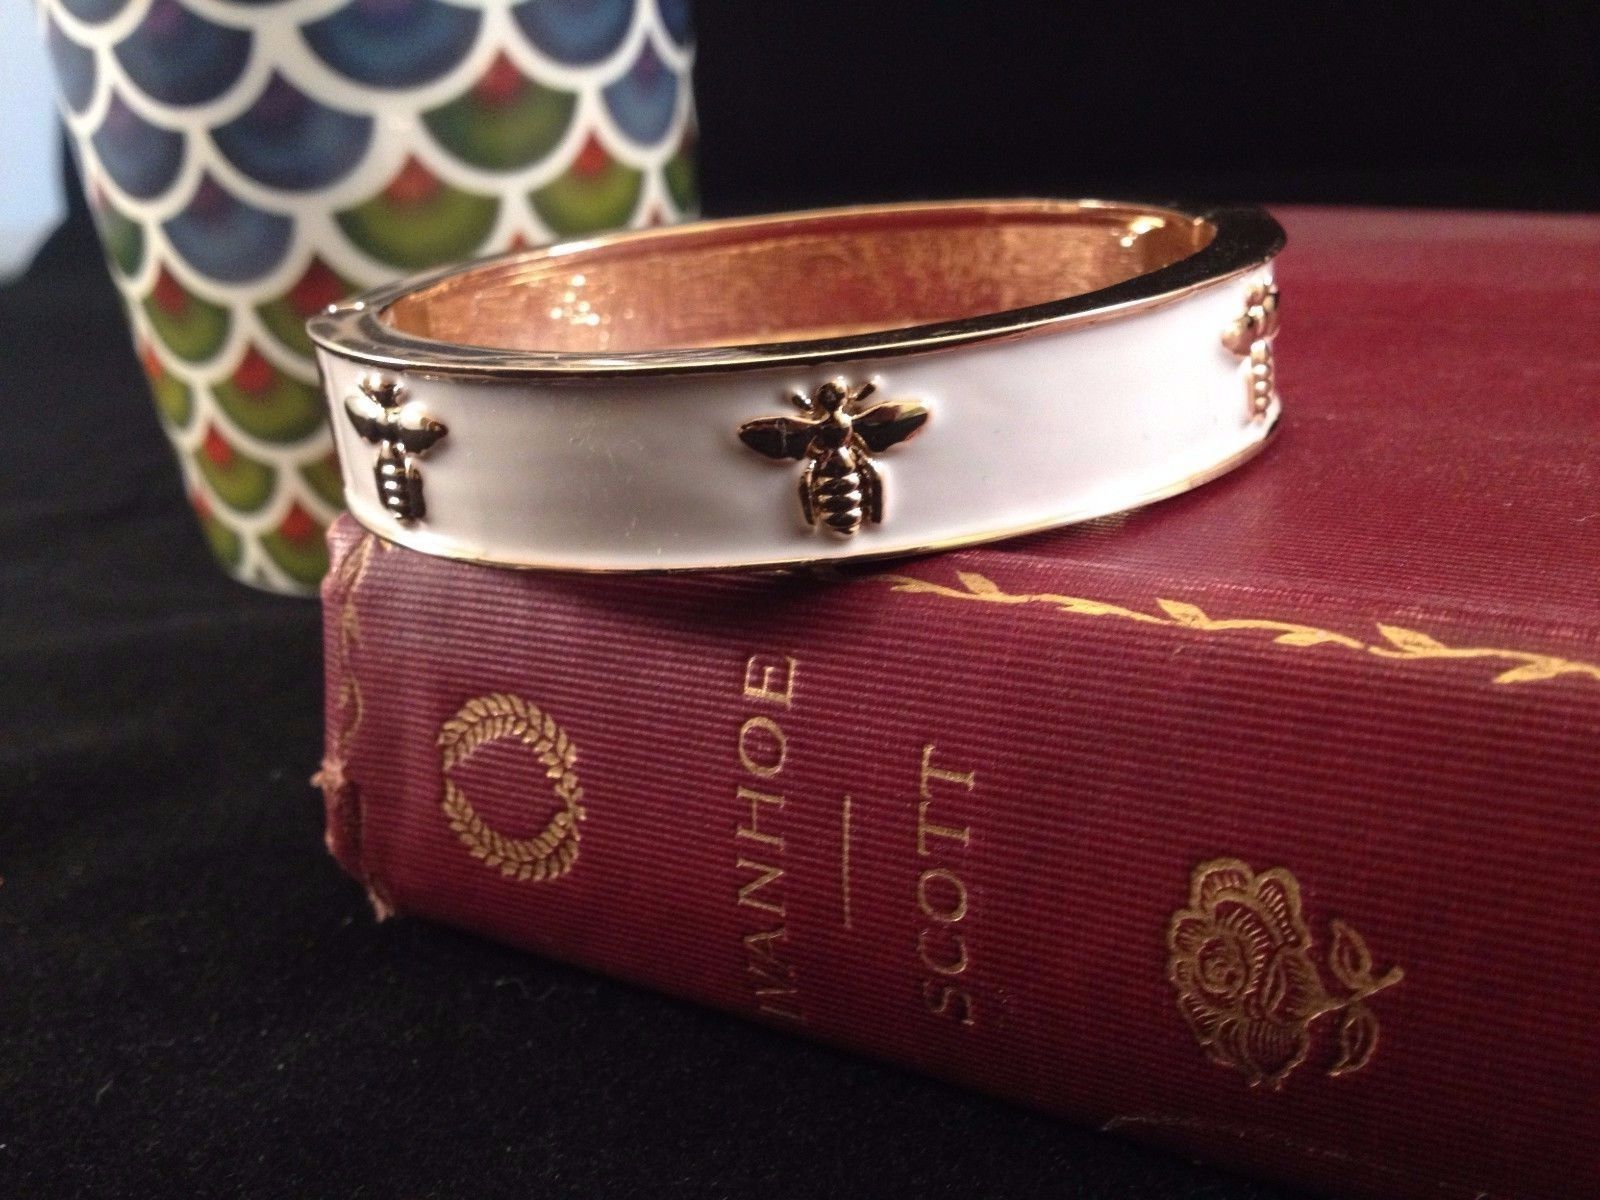 St. Germain Bee Bracelet Gold Ivory Enamel Bangle Luxury Hinged Classic Preppy